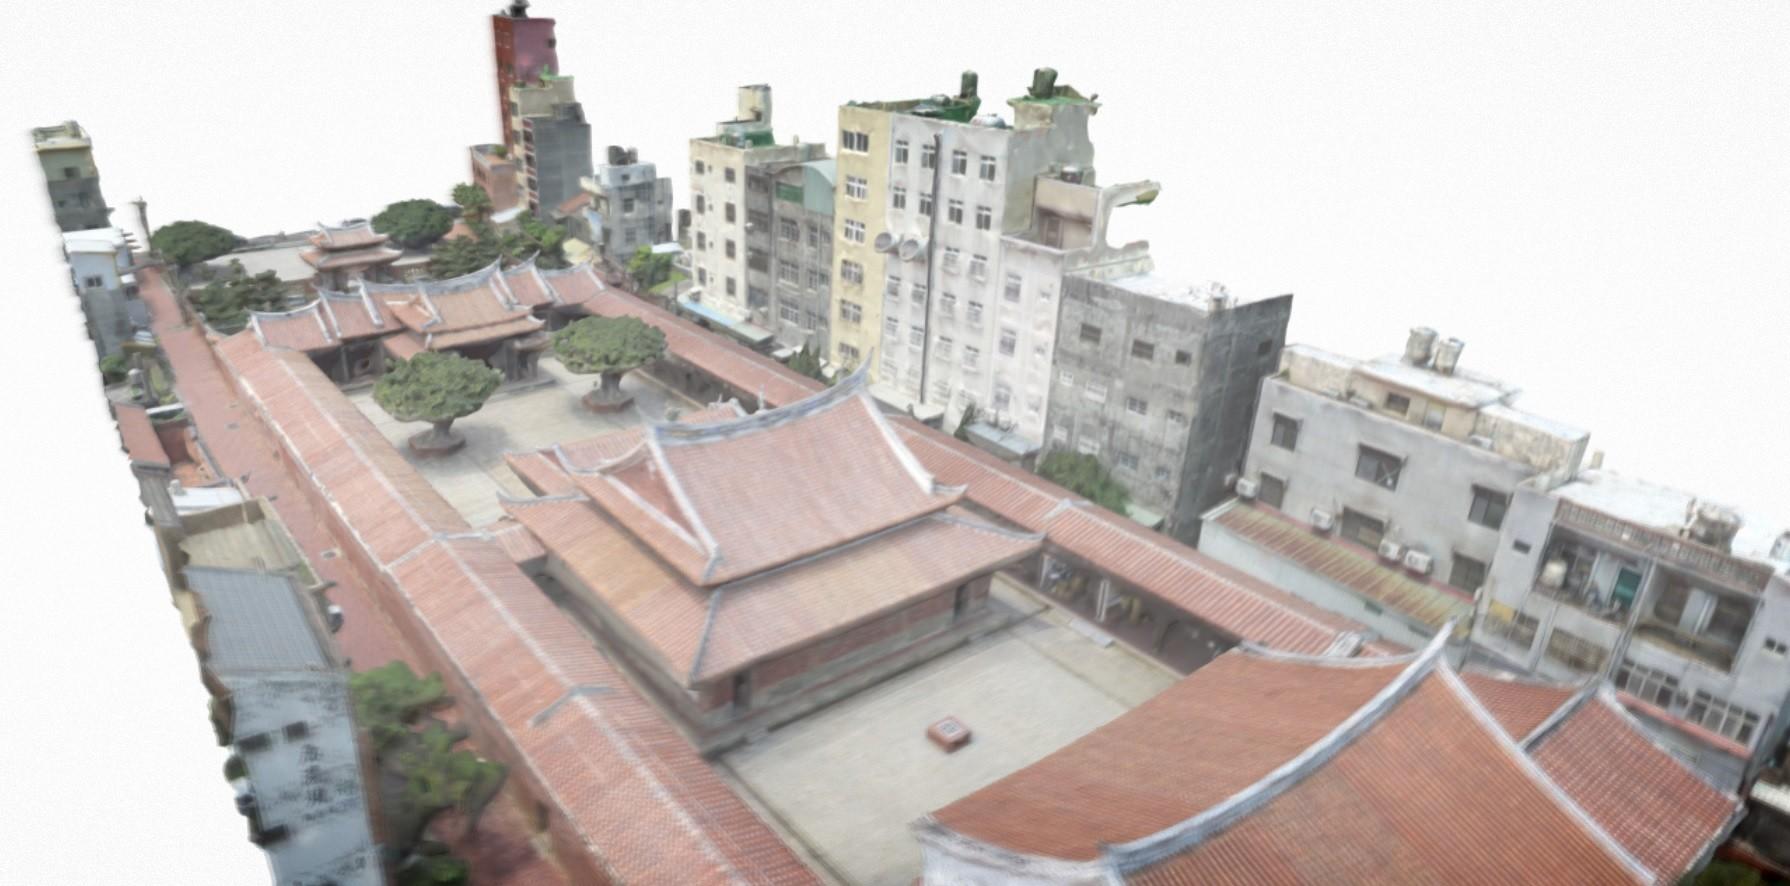 Condominium, Apartment, Urban area, Property, Roof, Suburb, urban area, Property, Building, Roof, Urban design, Residential area, Apartment, Neighbourhood, Architecture, Real estate, City